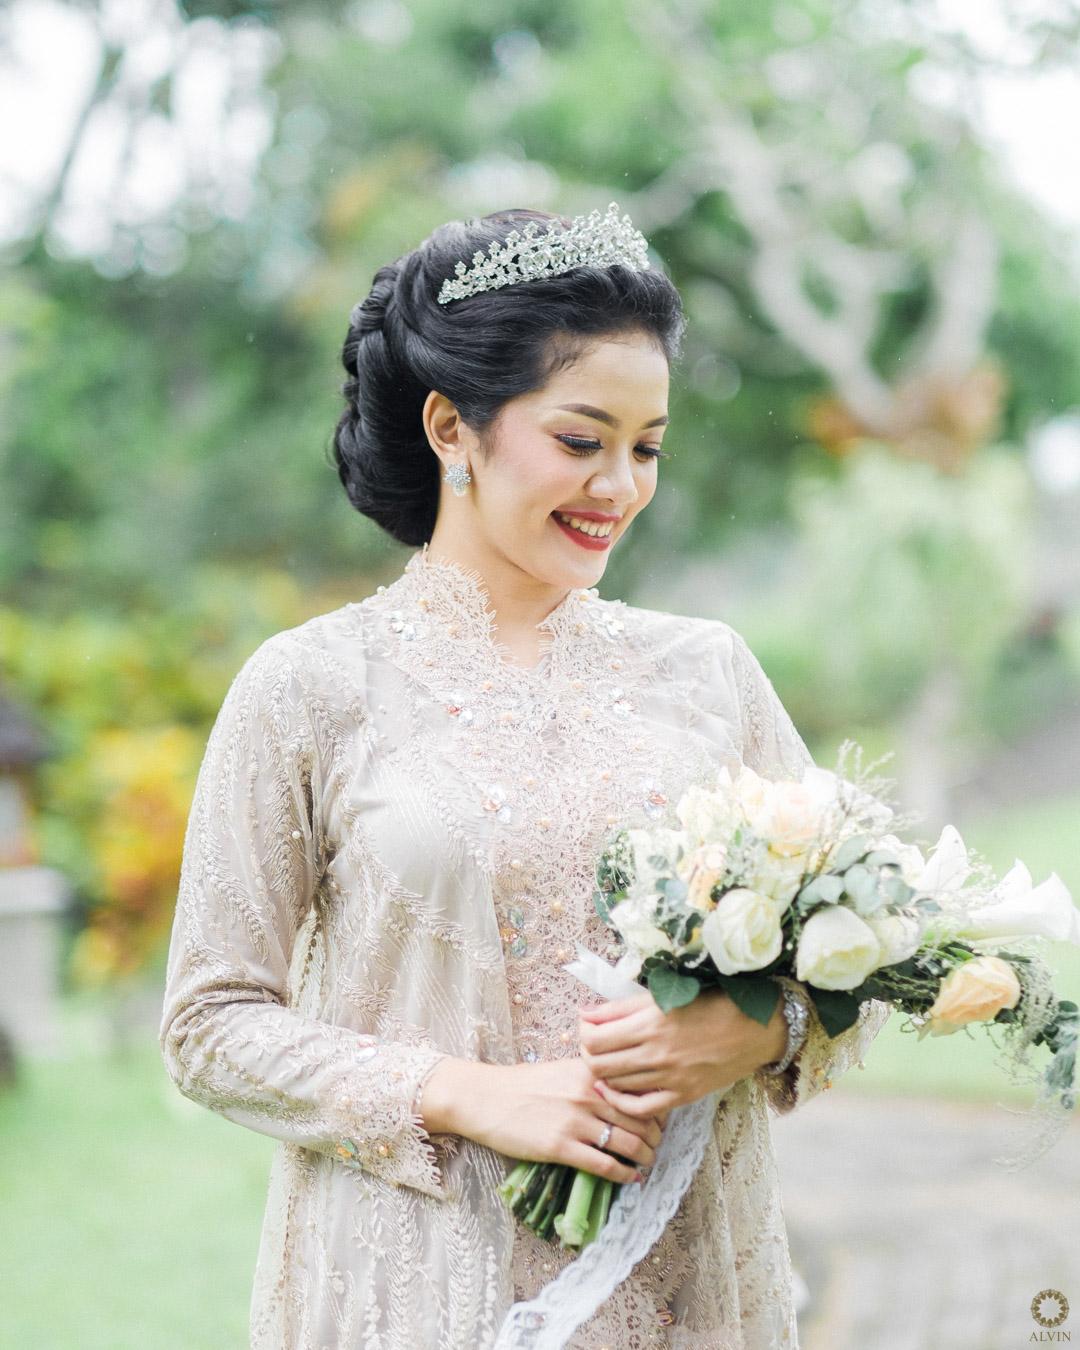 3 DSCF0564 : New Normal Wedding Ceremony